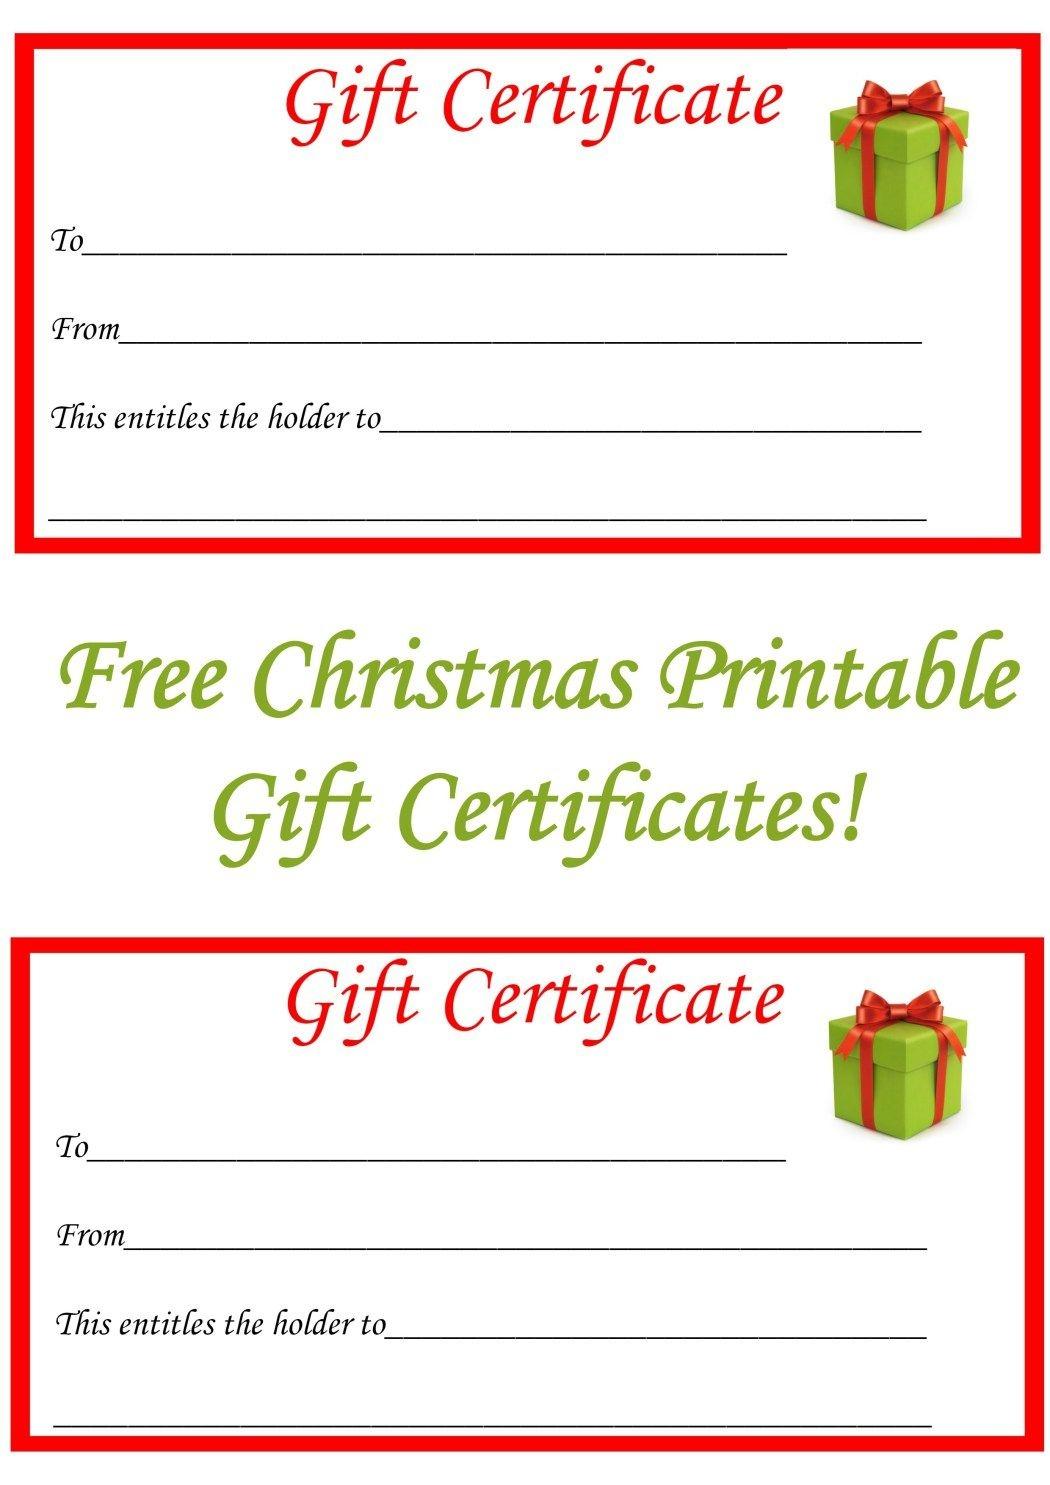 Free Christmas Printable Gift Certificates   Gift Ideas   Christmas - Free Printable Gift Coupons